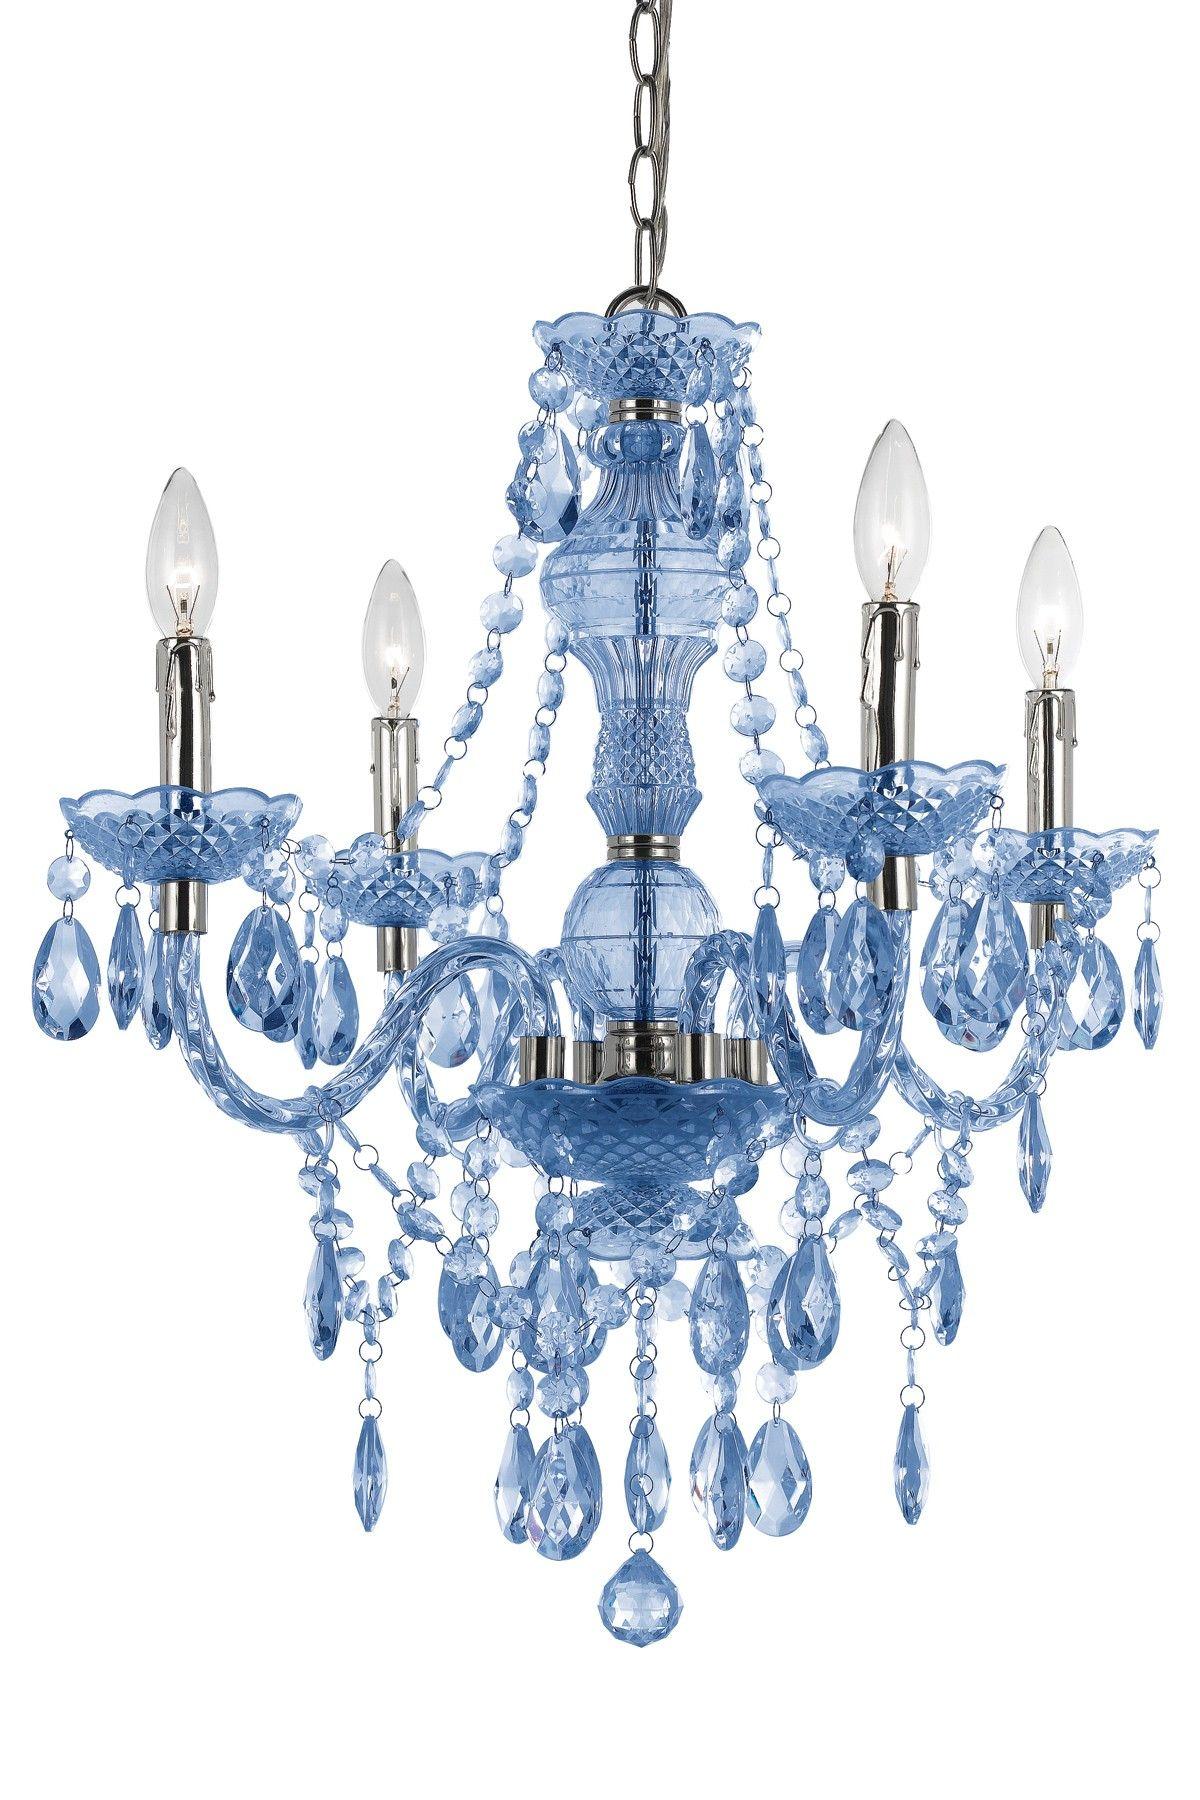 Naples blue mini chandelier on hautelook 吊灯 pinterest mini